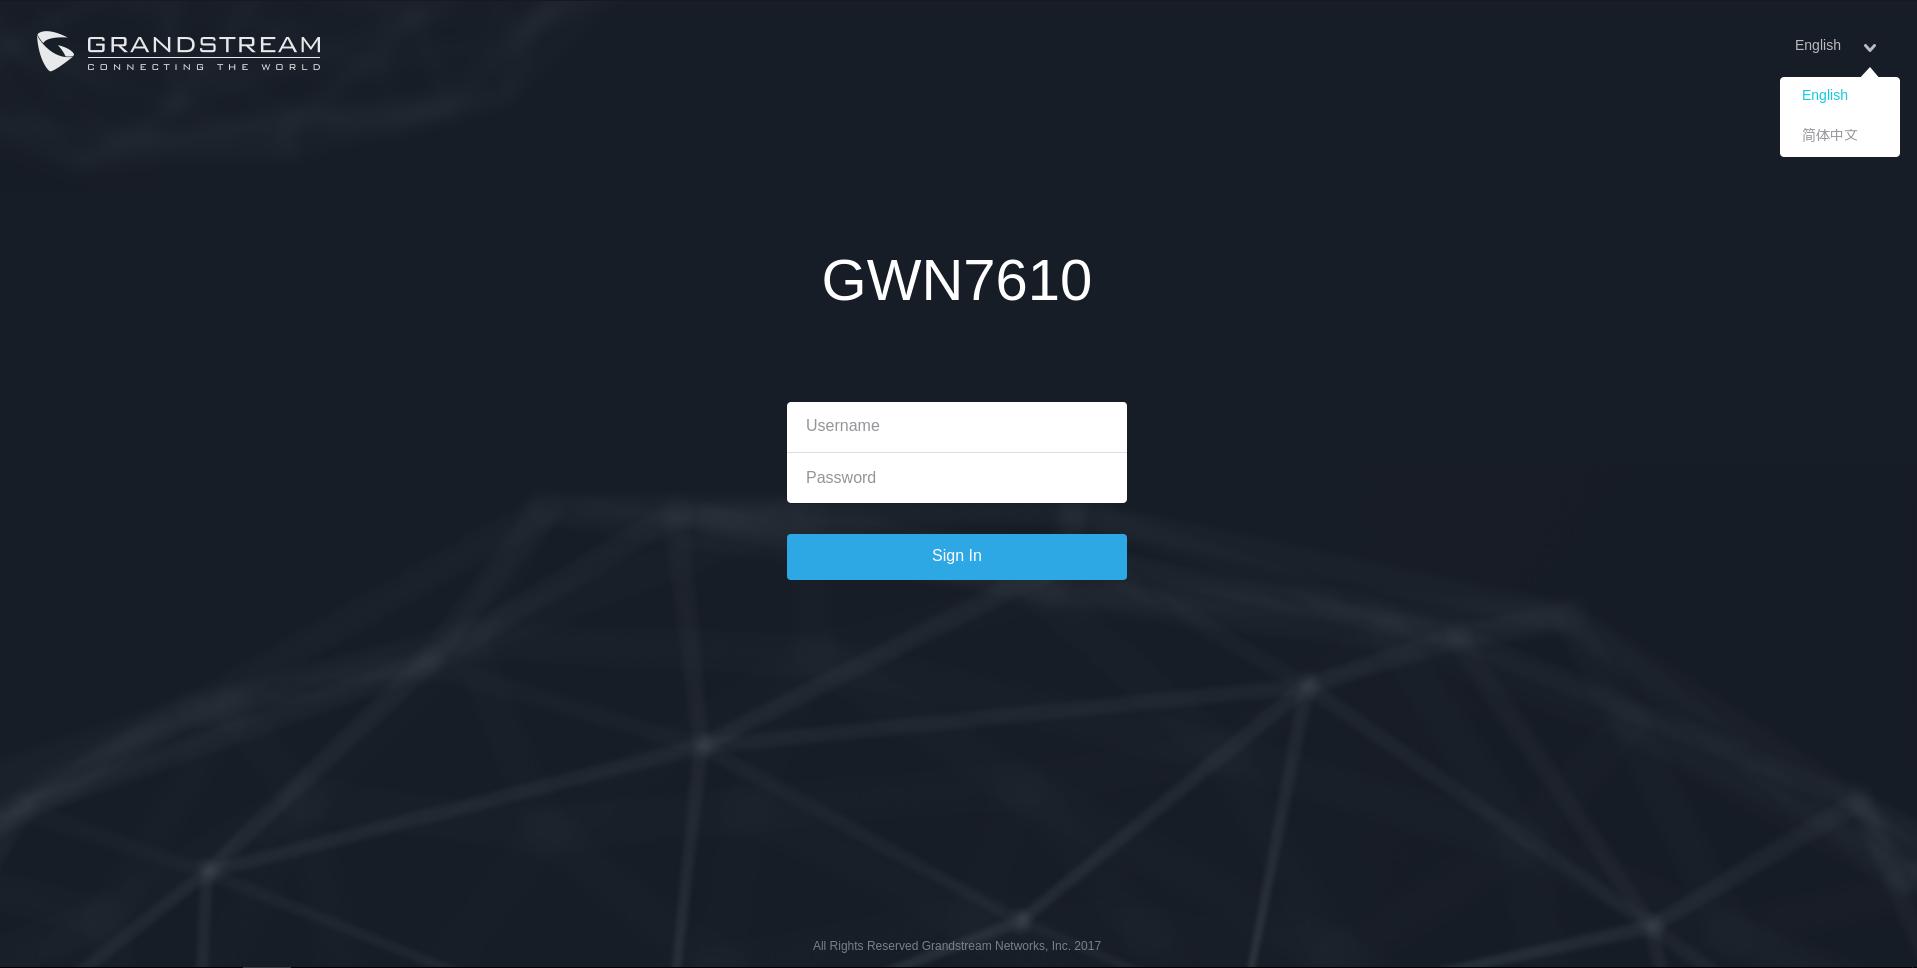 Обзор на wifi точки доступа Grandstream GWN7610 - 2